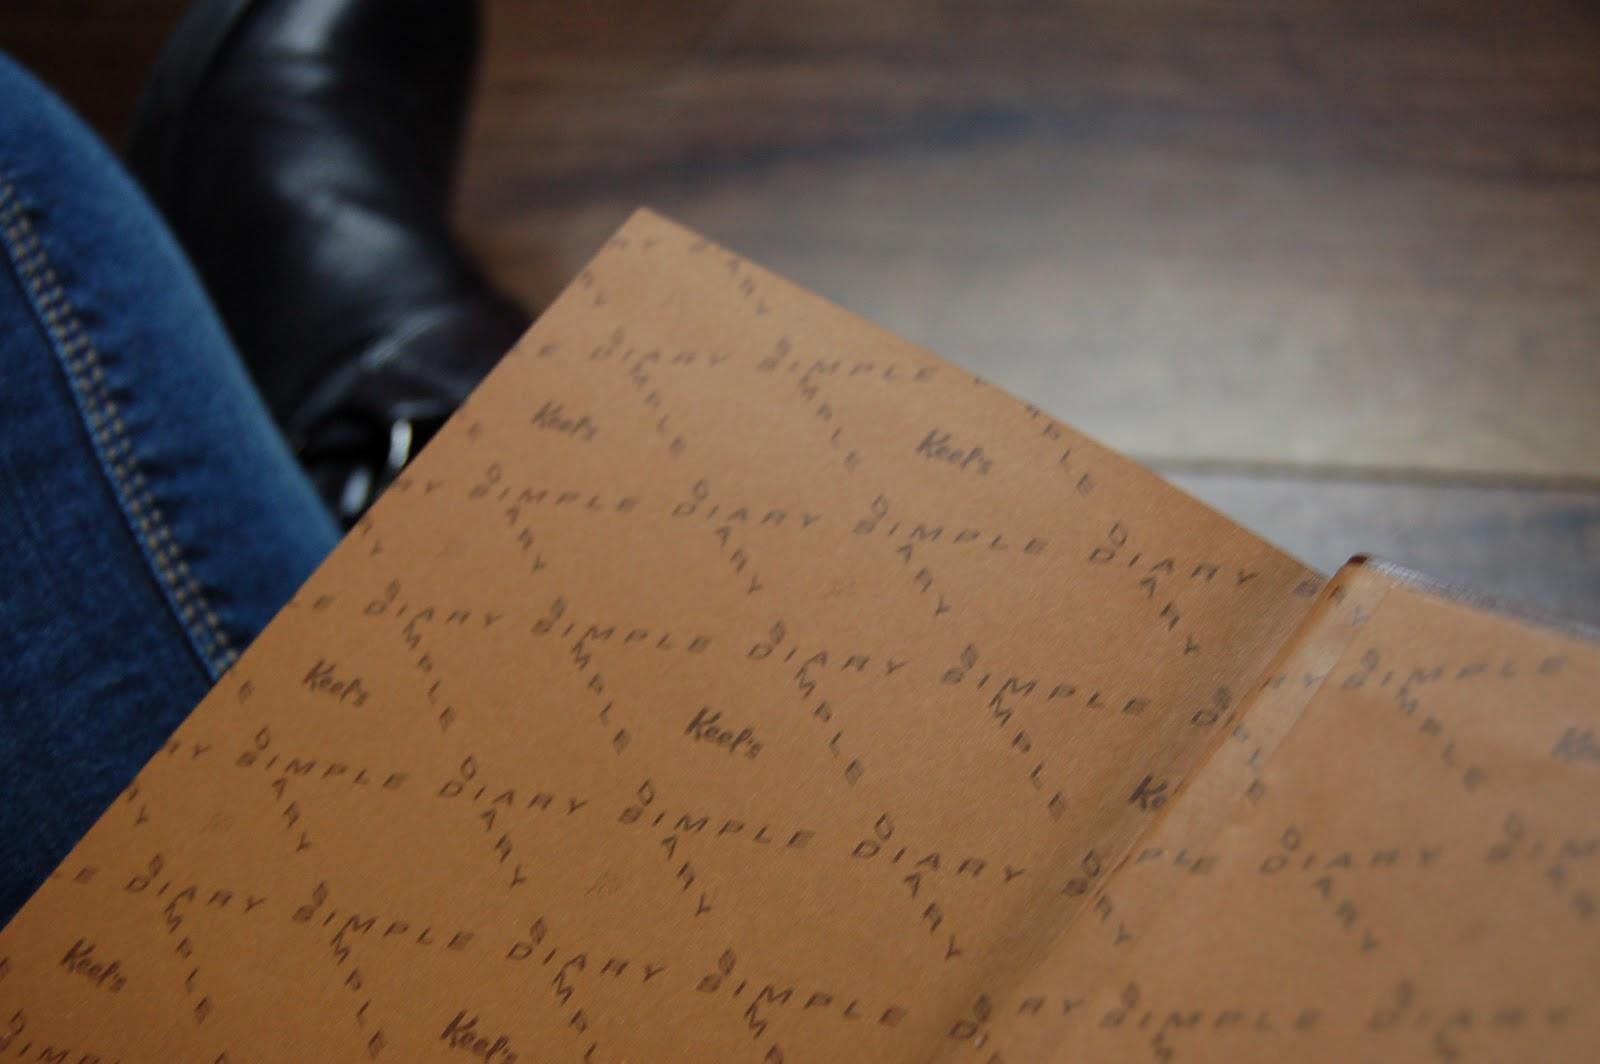 journal-intime-simple-diary-keel's-édition-française-couverture-marron-cuir